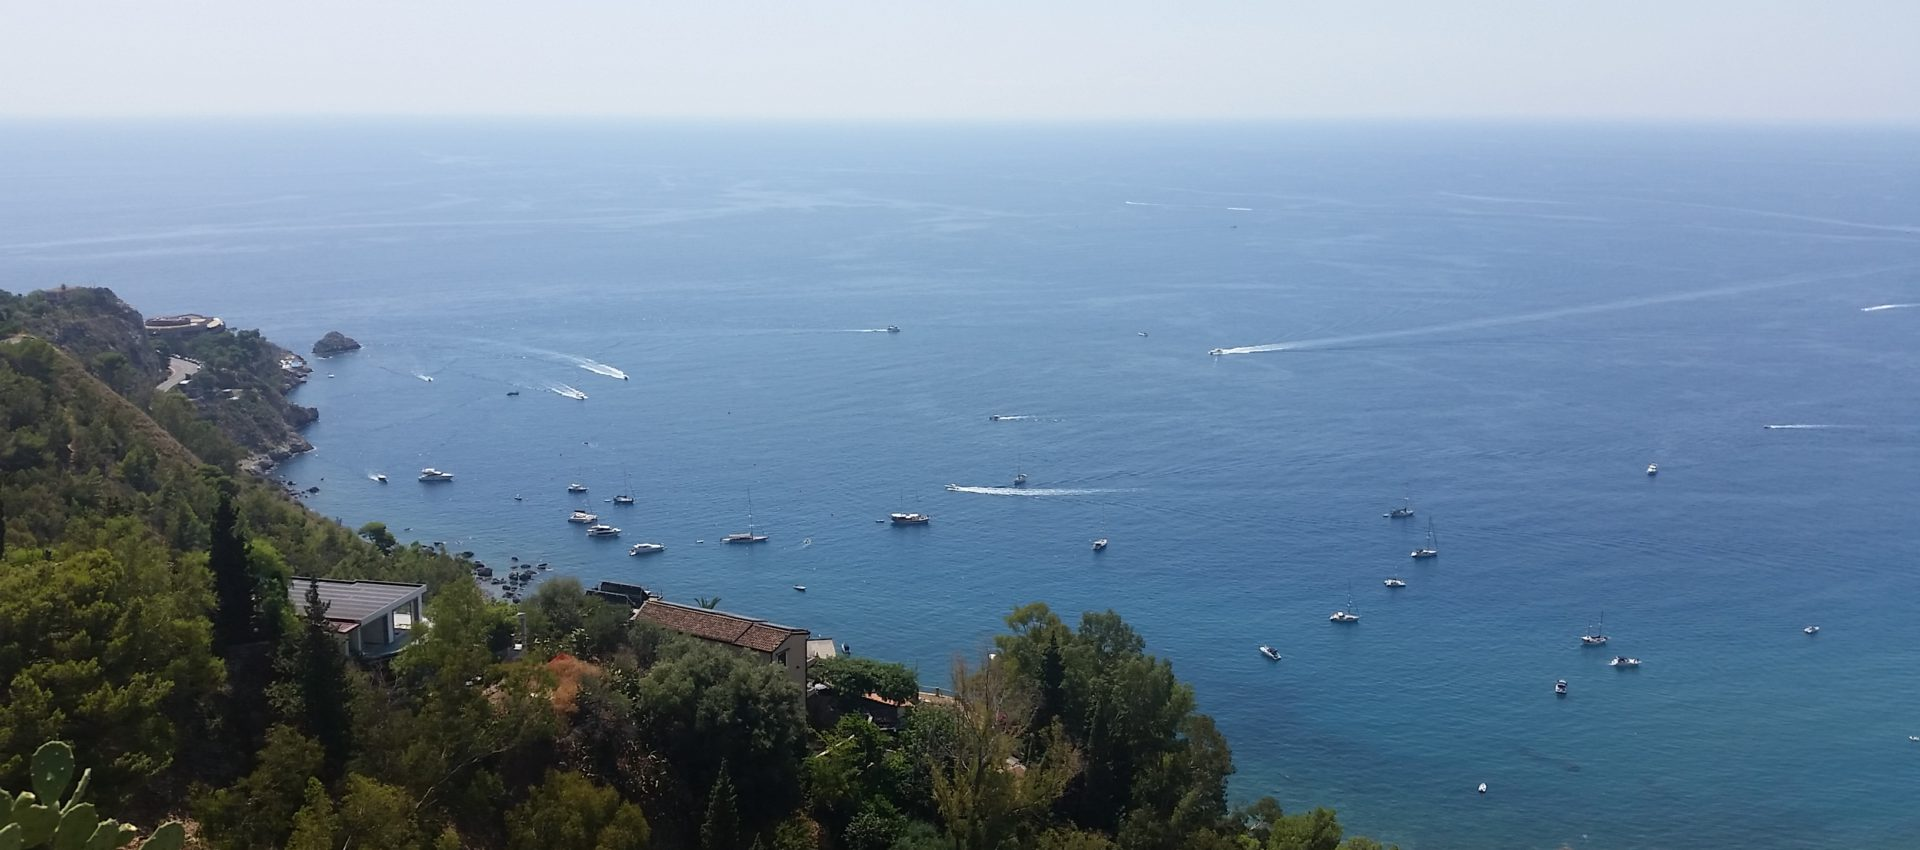 Vista da Piazza IX Aprile del Golfo di Taormina